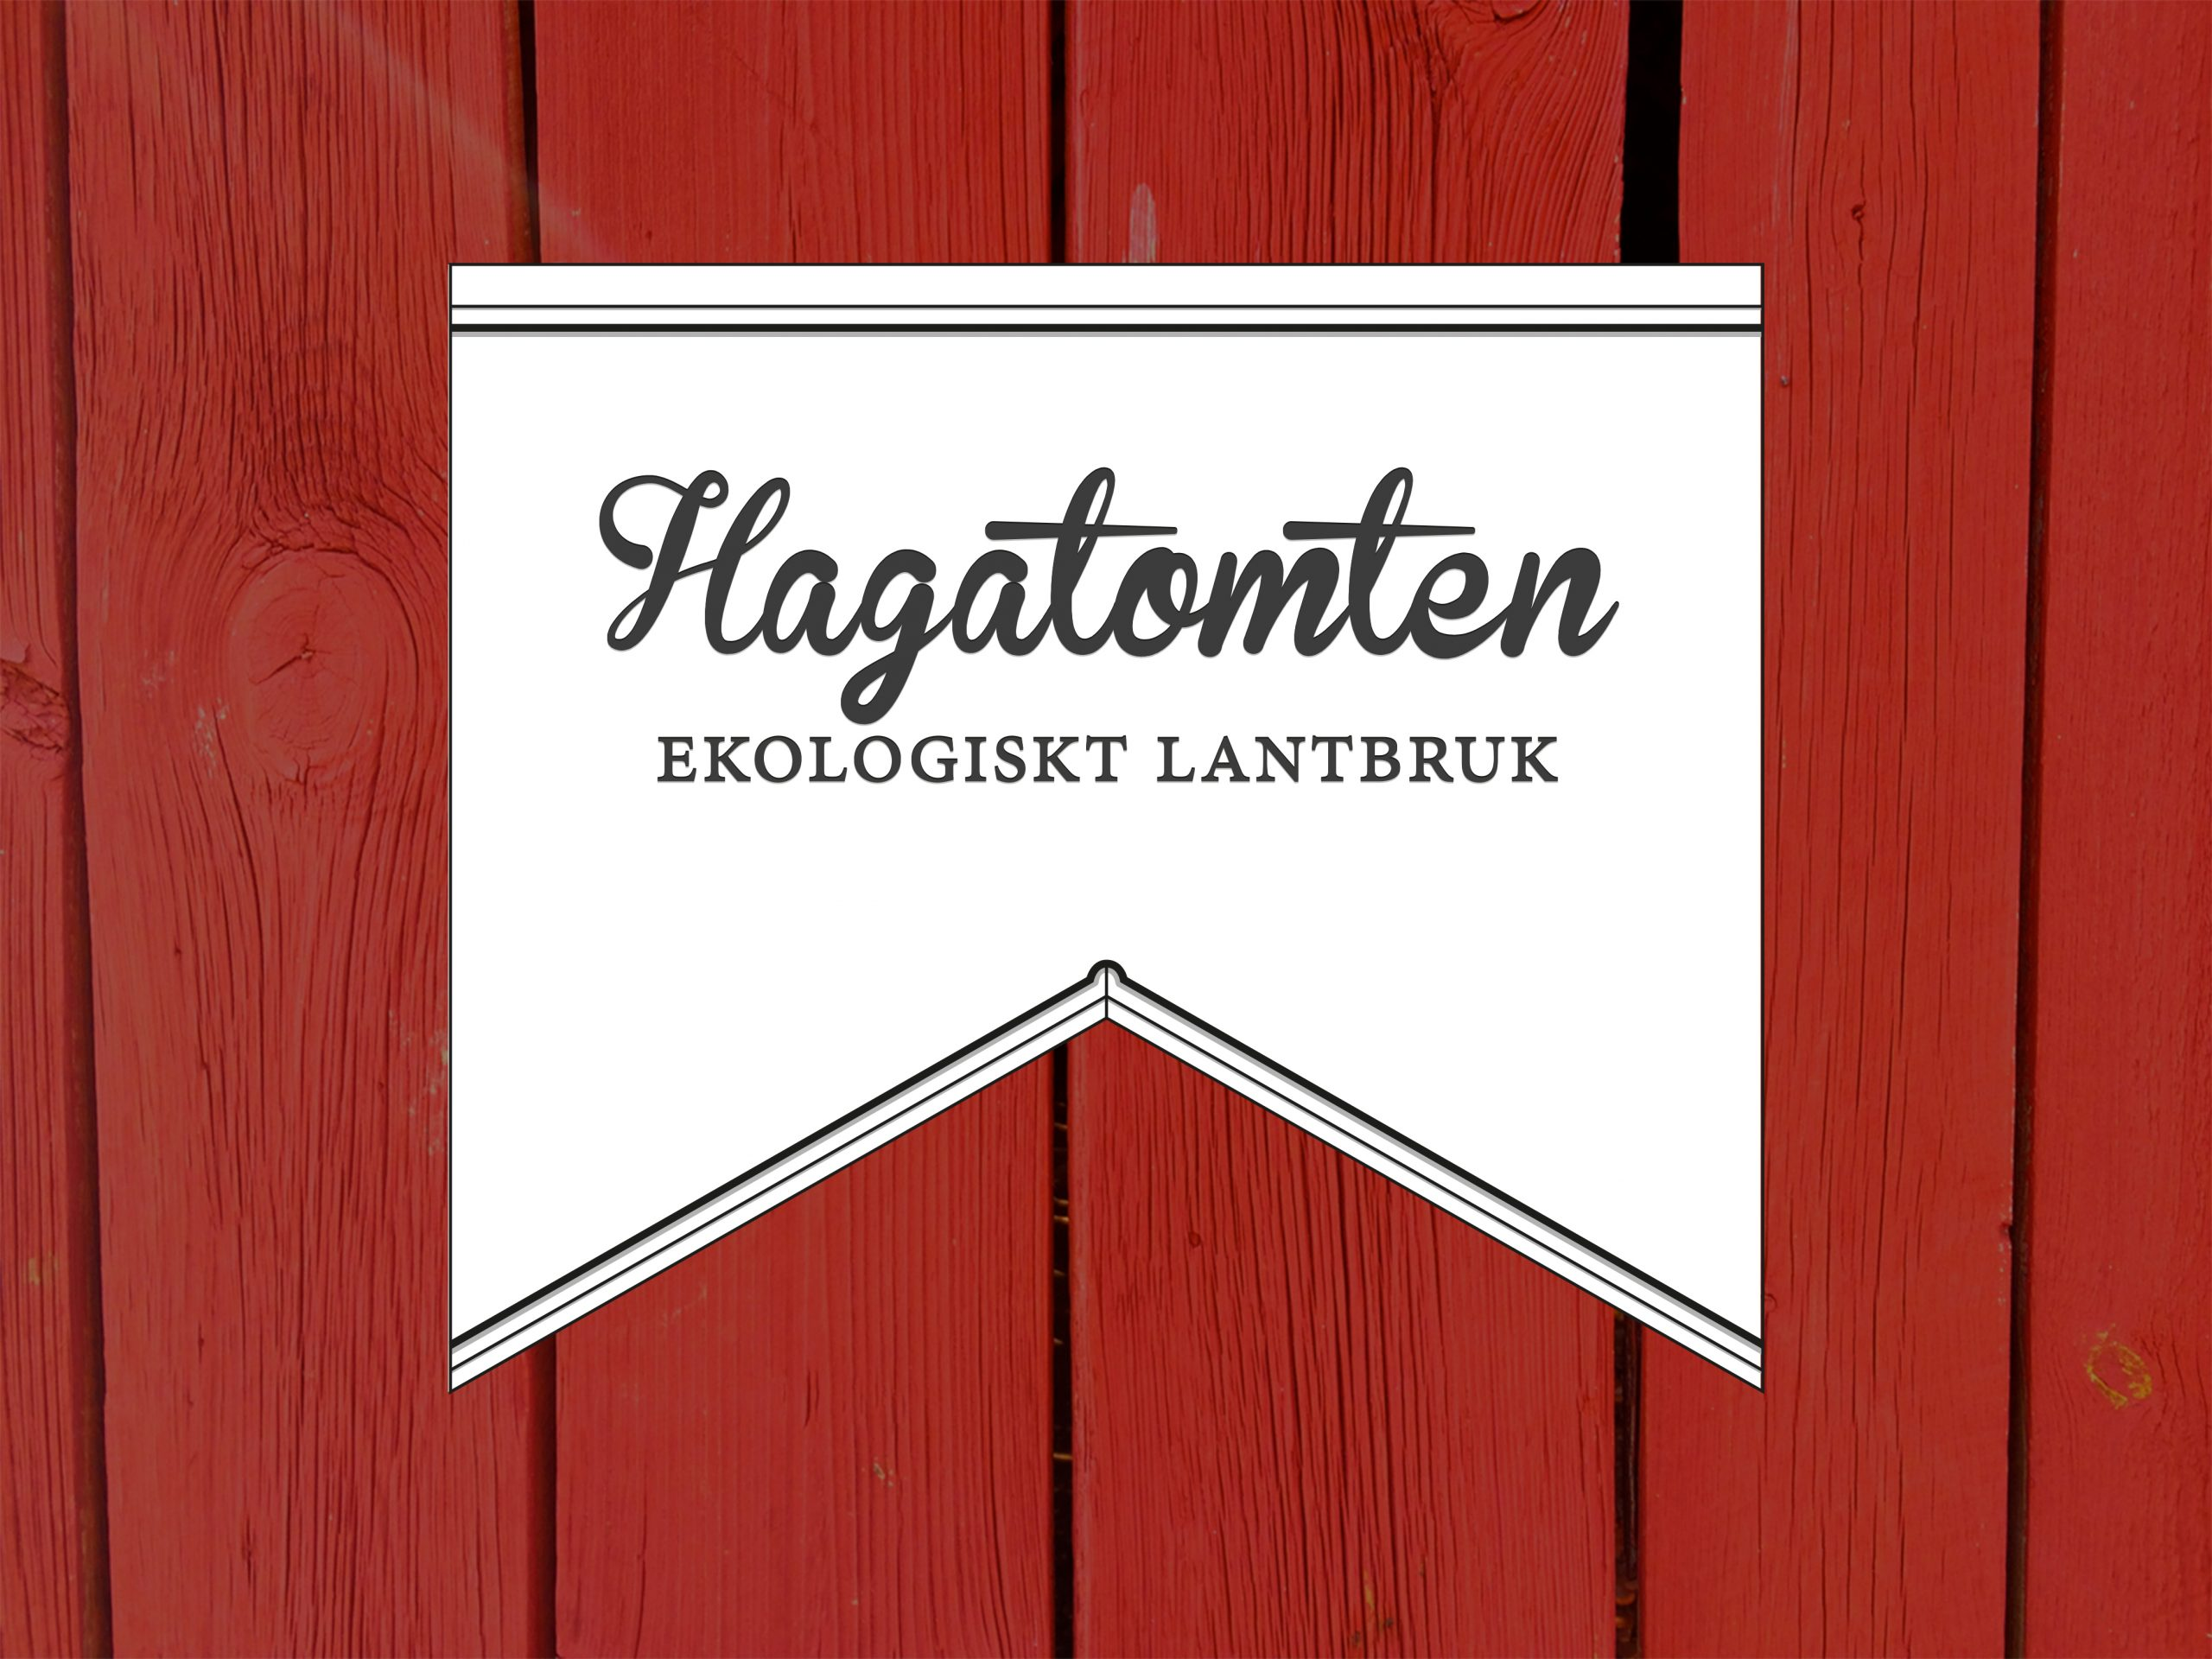 Logotype till ekologiskt lantbruk, hagatomten ekologiskt lantbruk